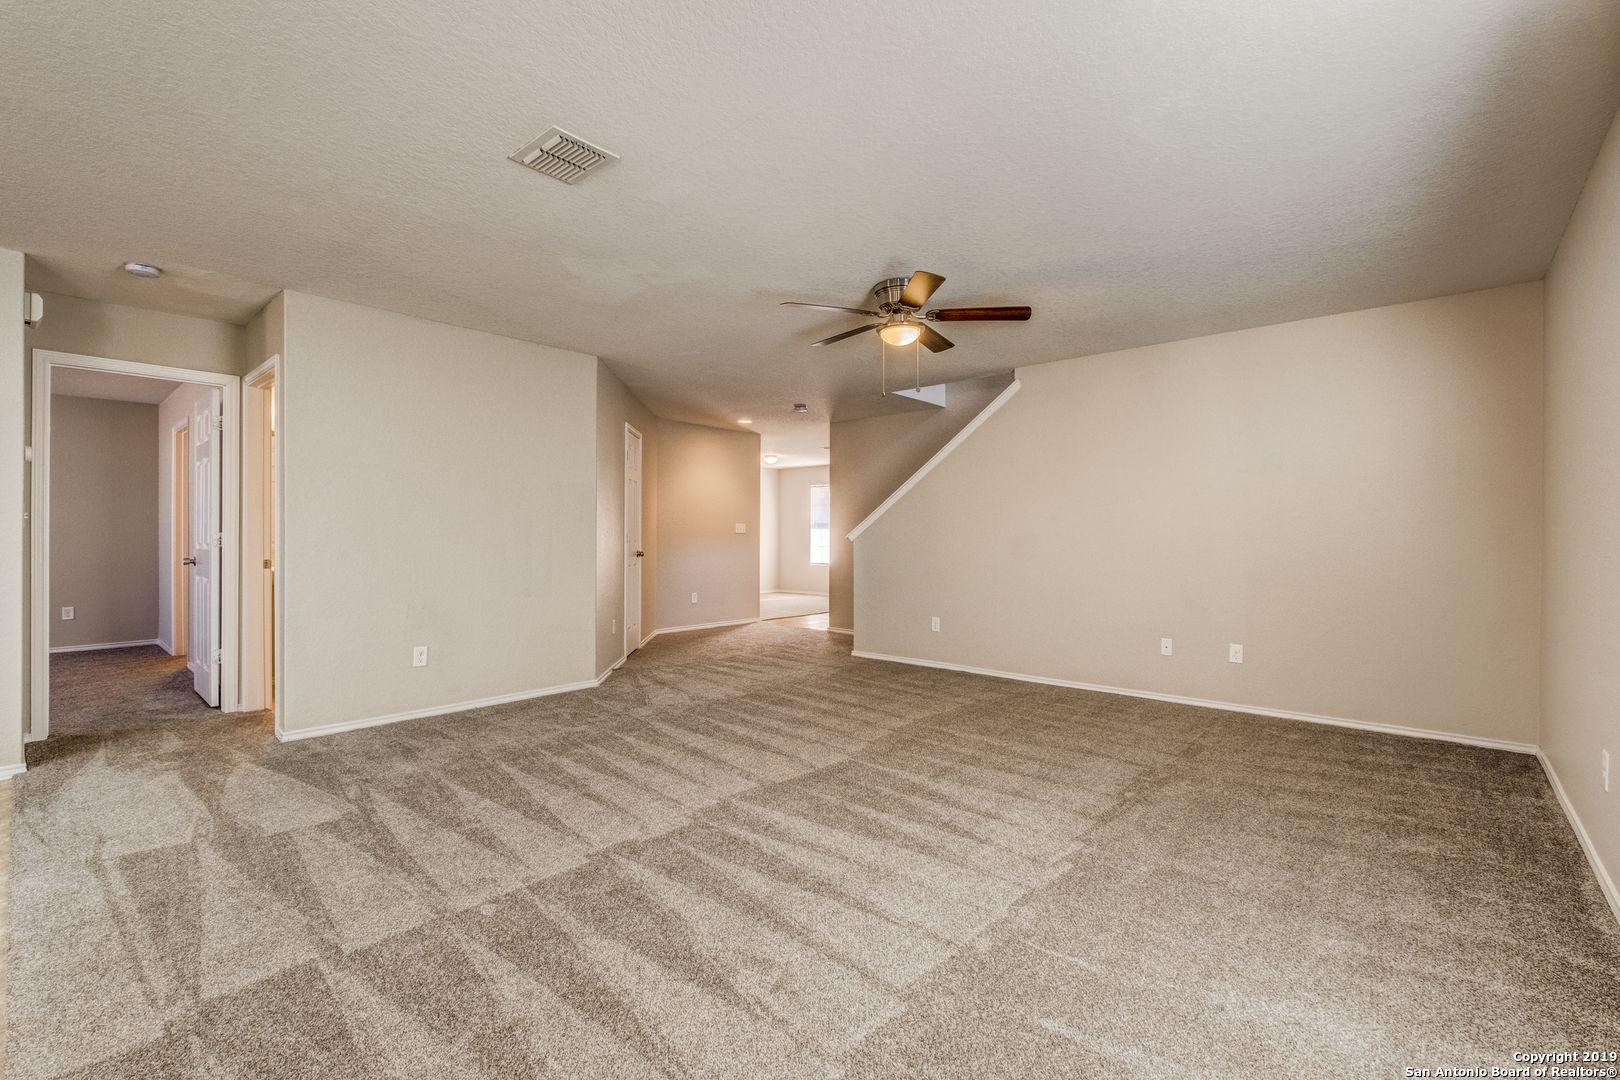 RENTTOOWN THIS HOME! (SanAntonio, TX 78254)🎈 4 beds 2